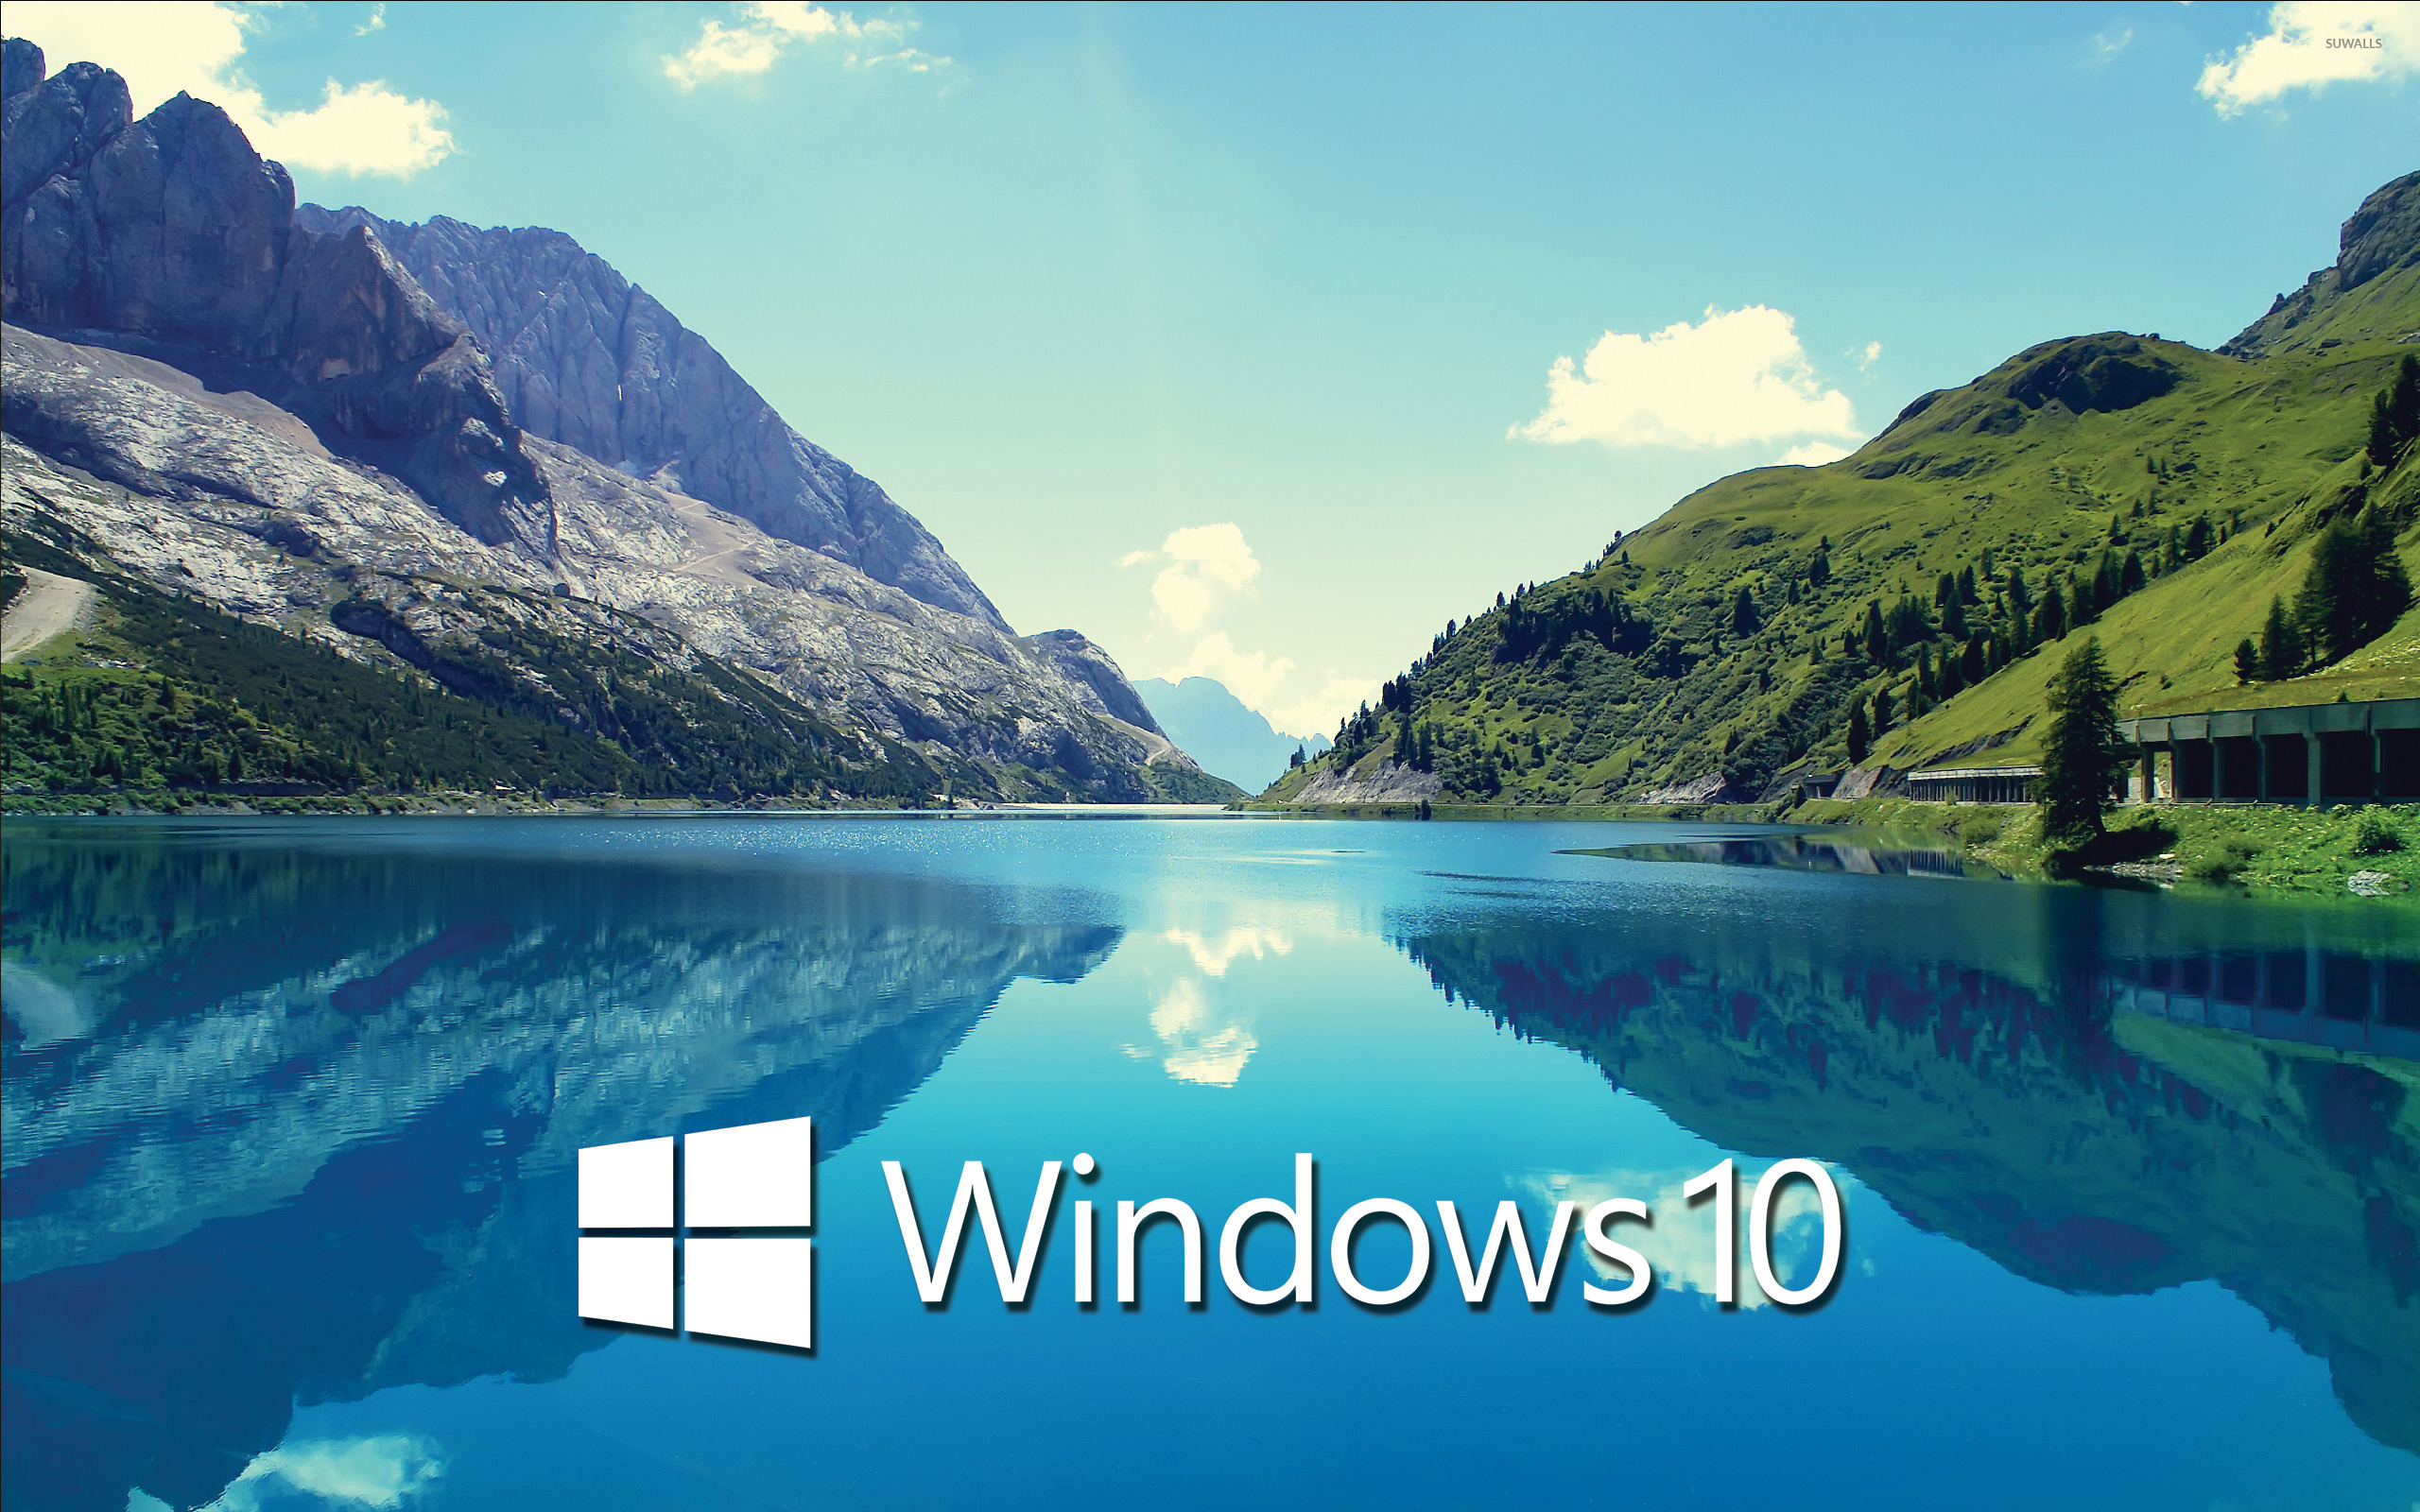 Fantastic Wallpaper Mountain Windows 10 - windows-10-46260-2560x1600  Snapshot_597691.jpg